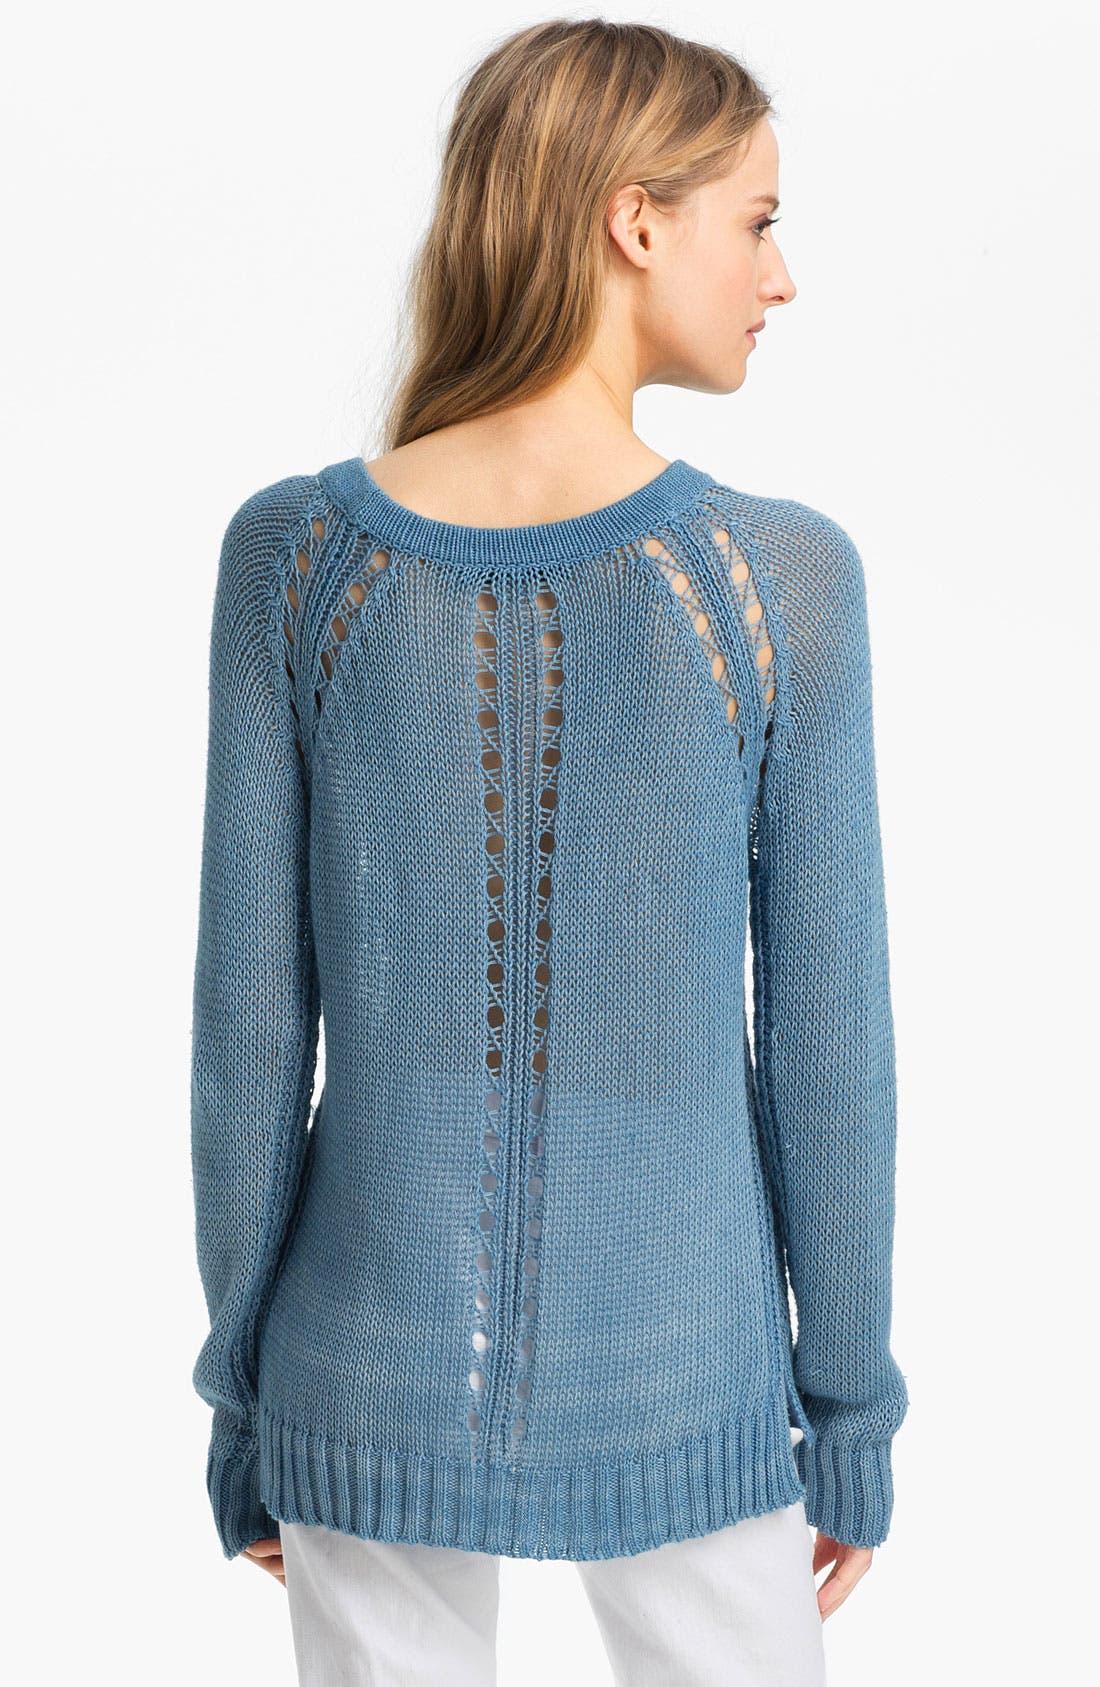 Alternate Image 3  - rag & bone/JEAN 'Bay' Sweater